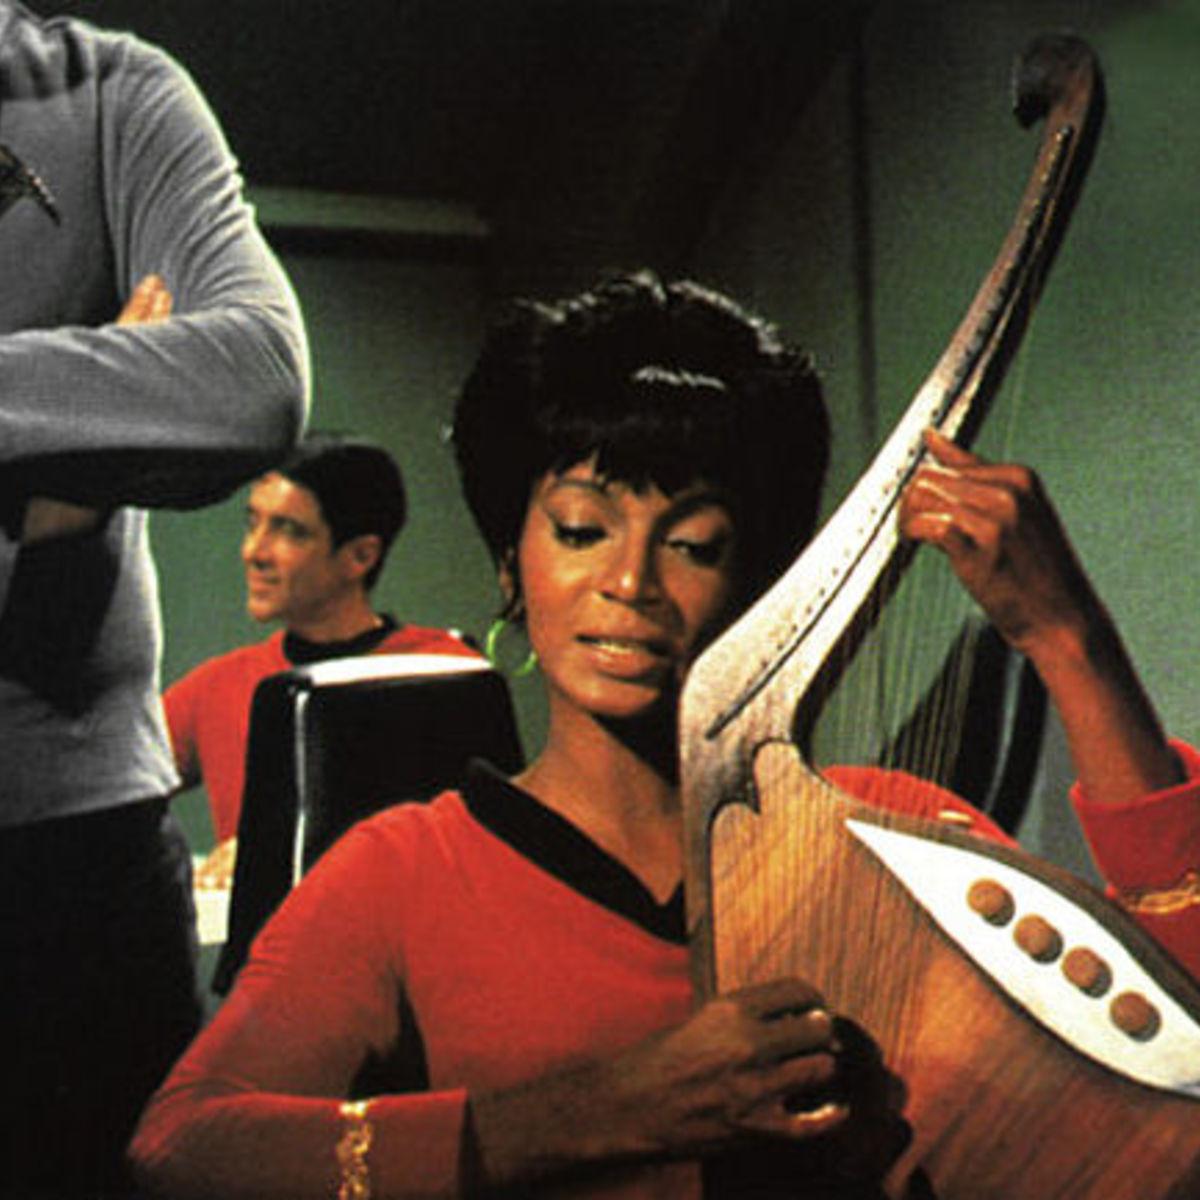 StarTrek_uhura_Nichols_singing_0.jpg